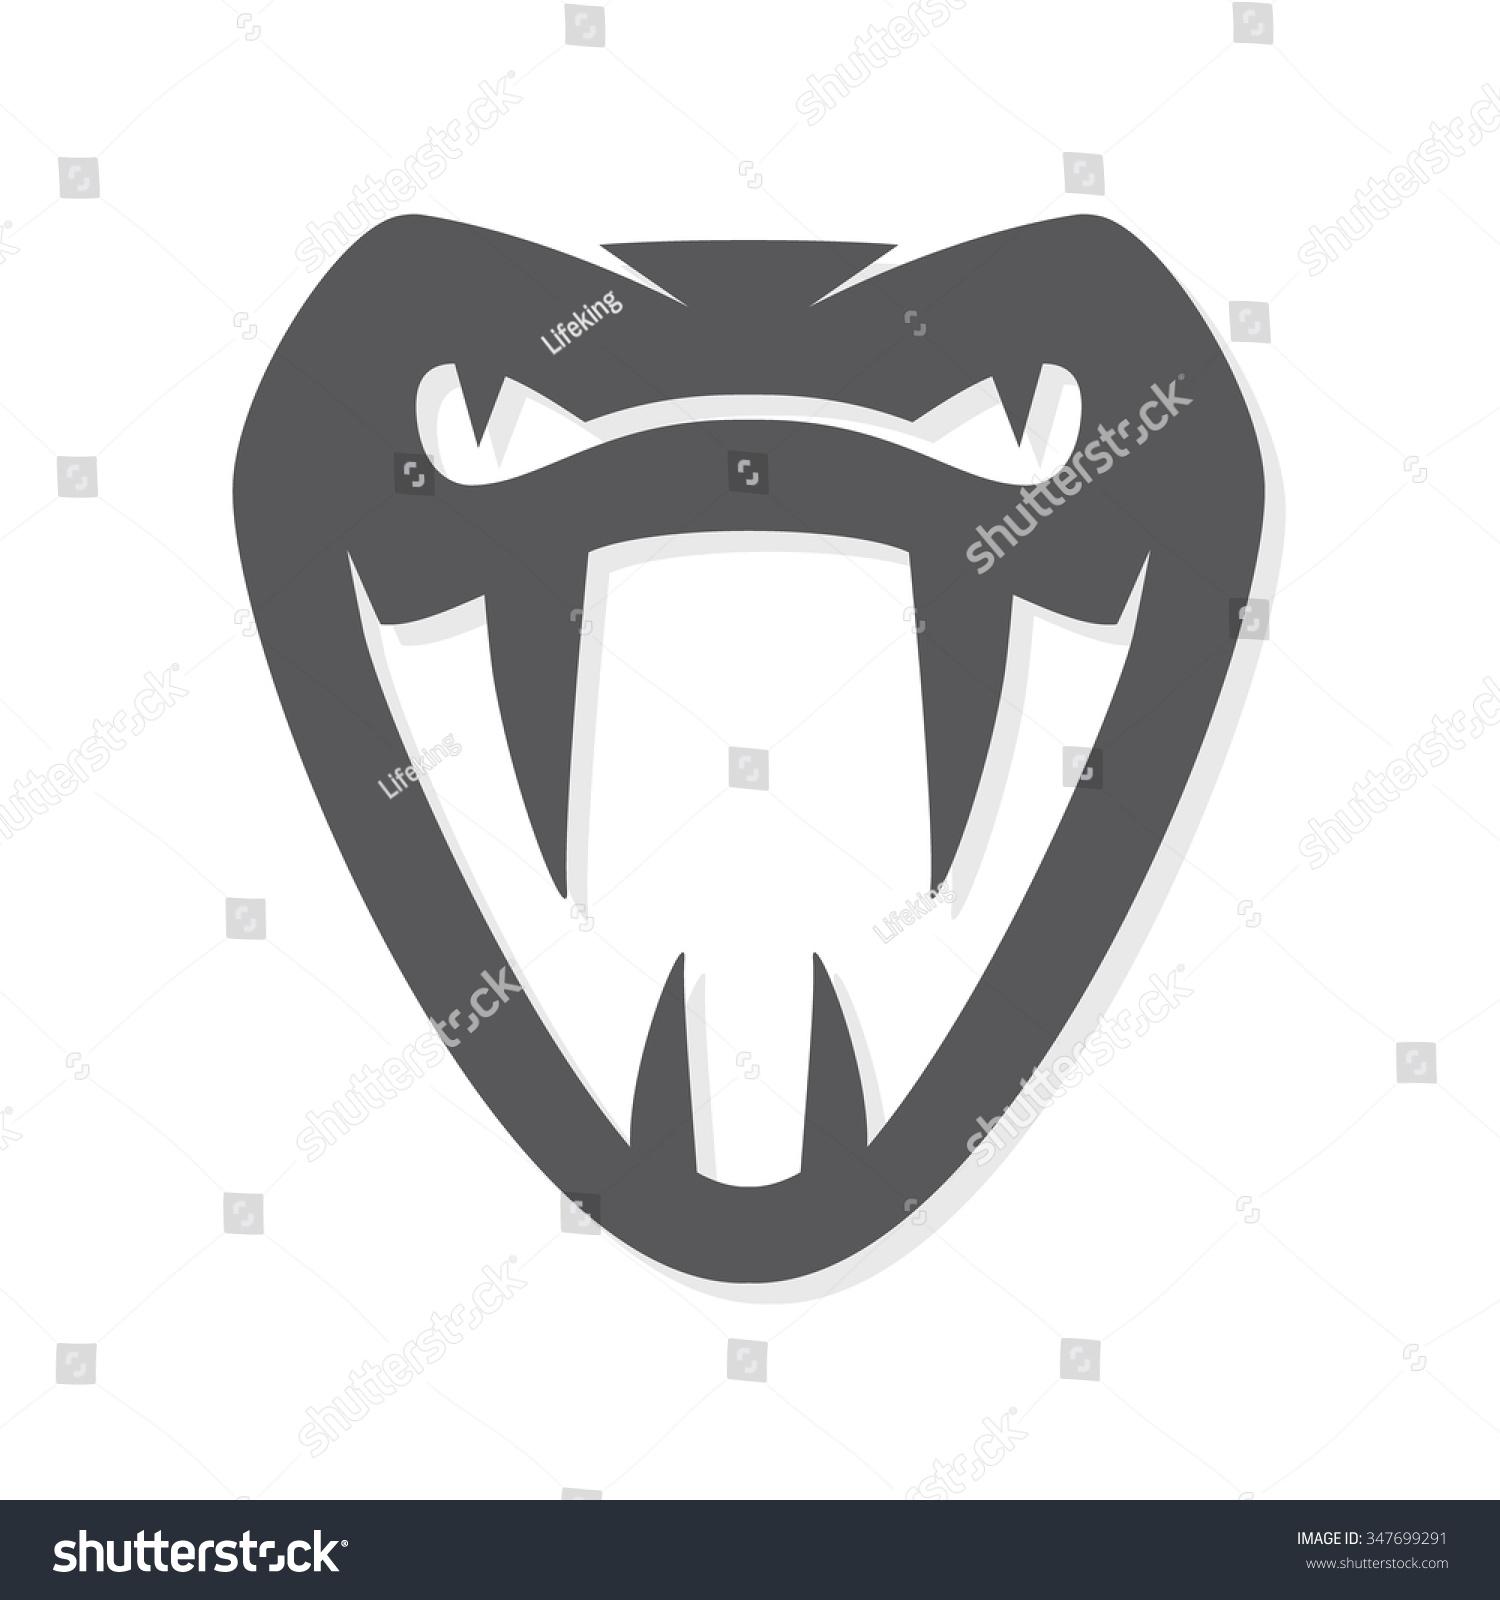 Rattlesnake head logo - photo#19